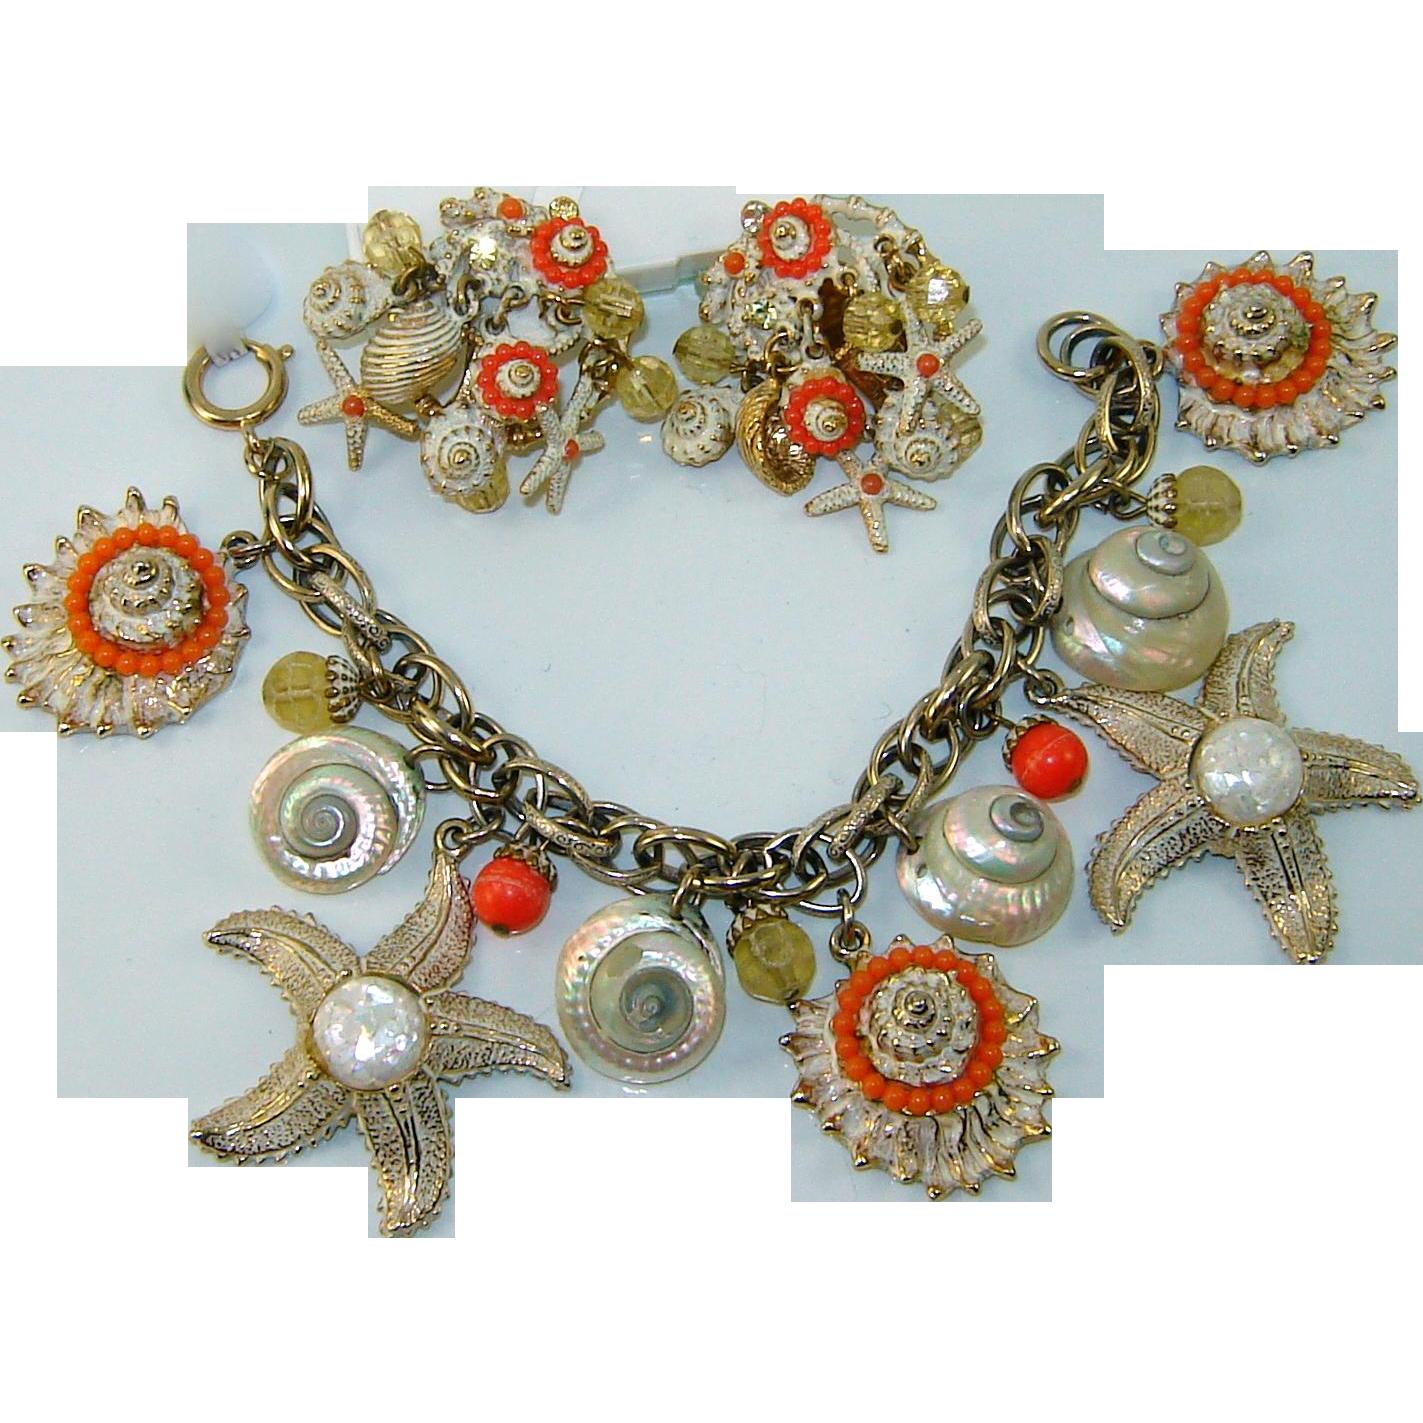 Vintage Signed ART Starfish Shells Charm Bracelet Earrings Set